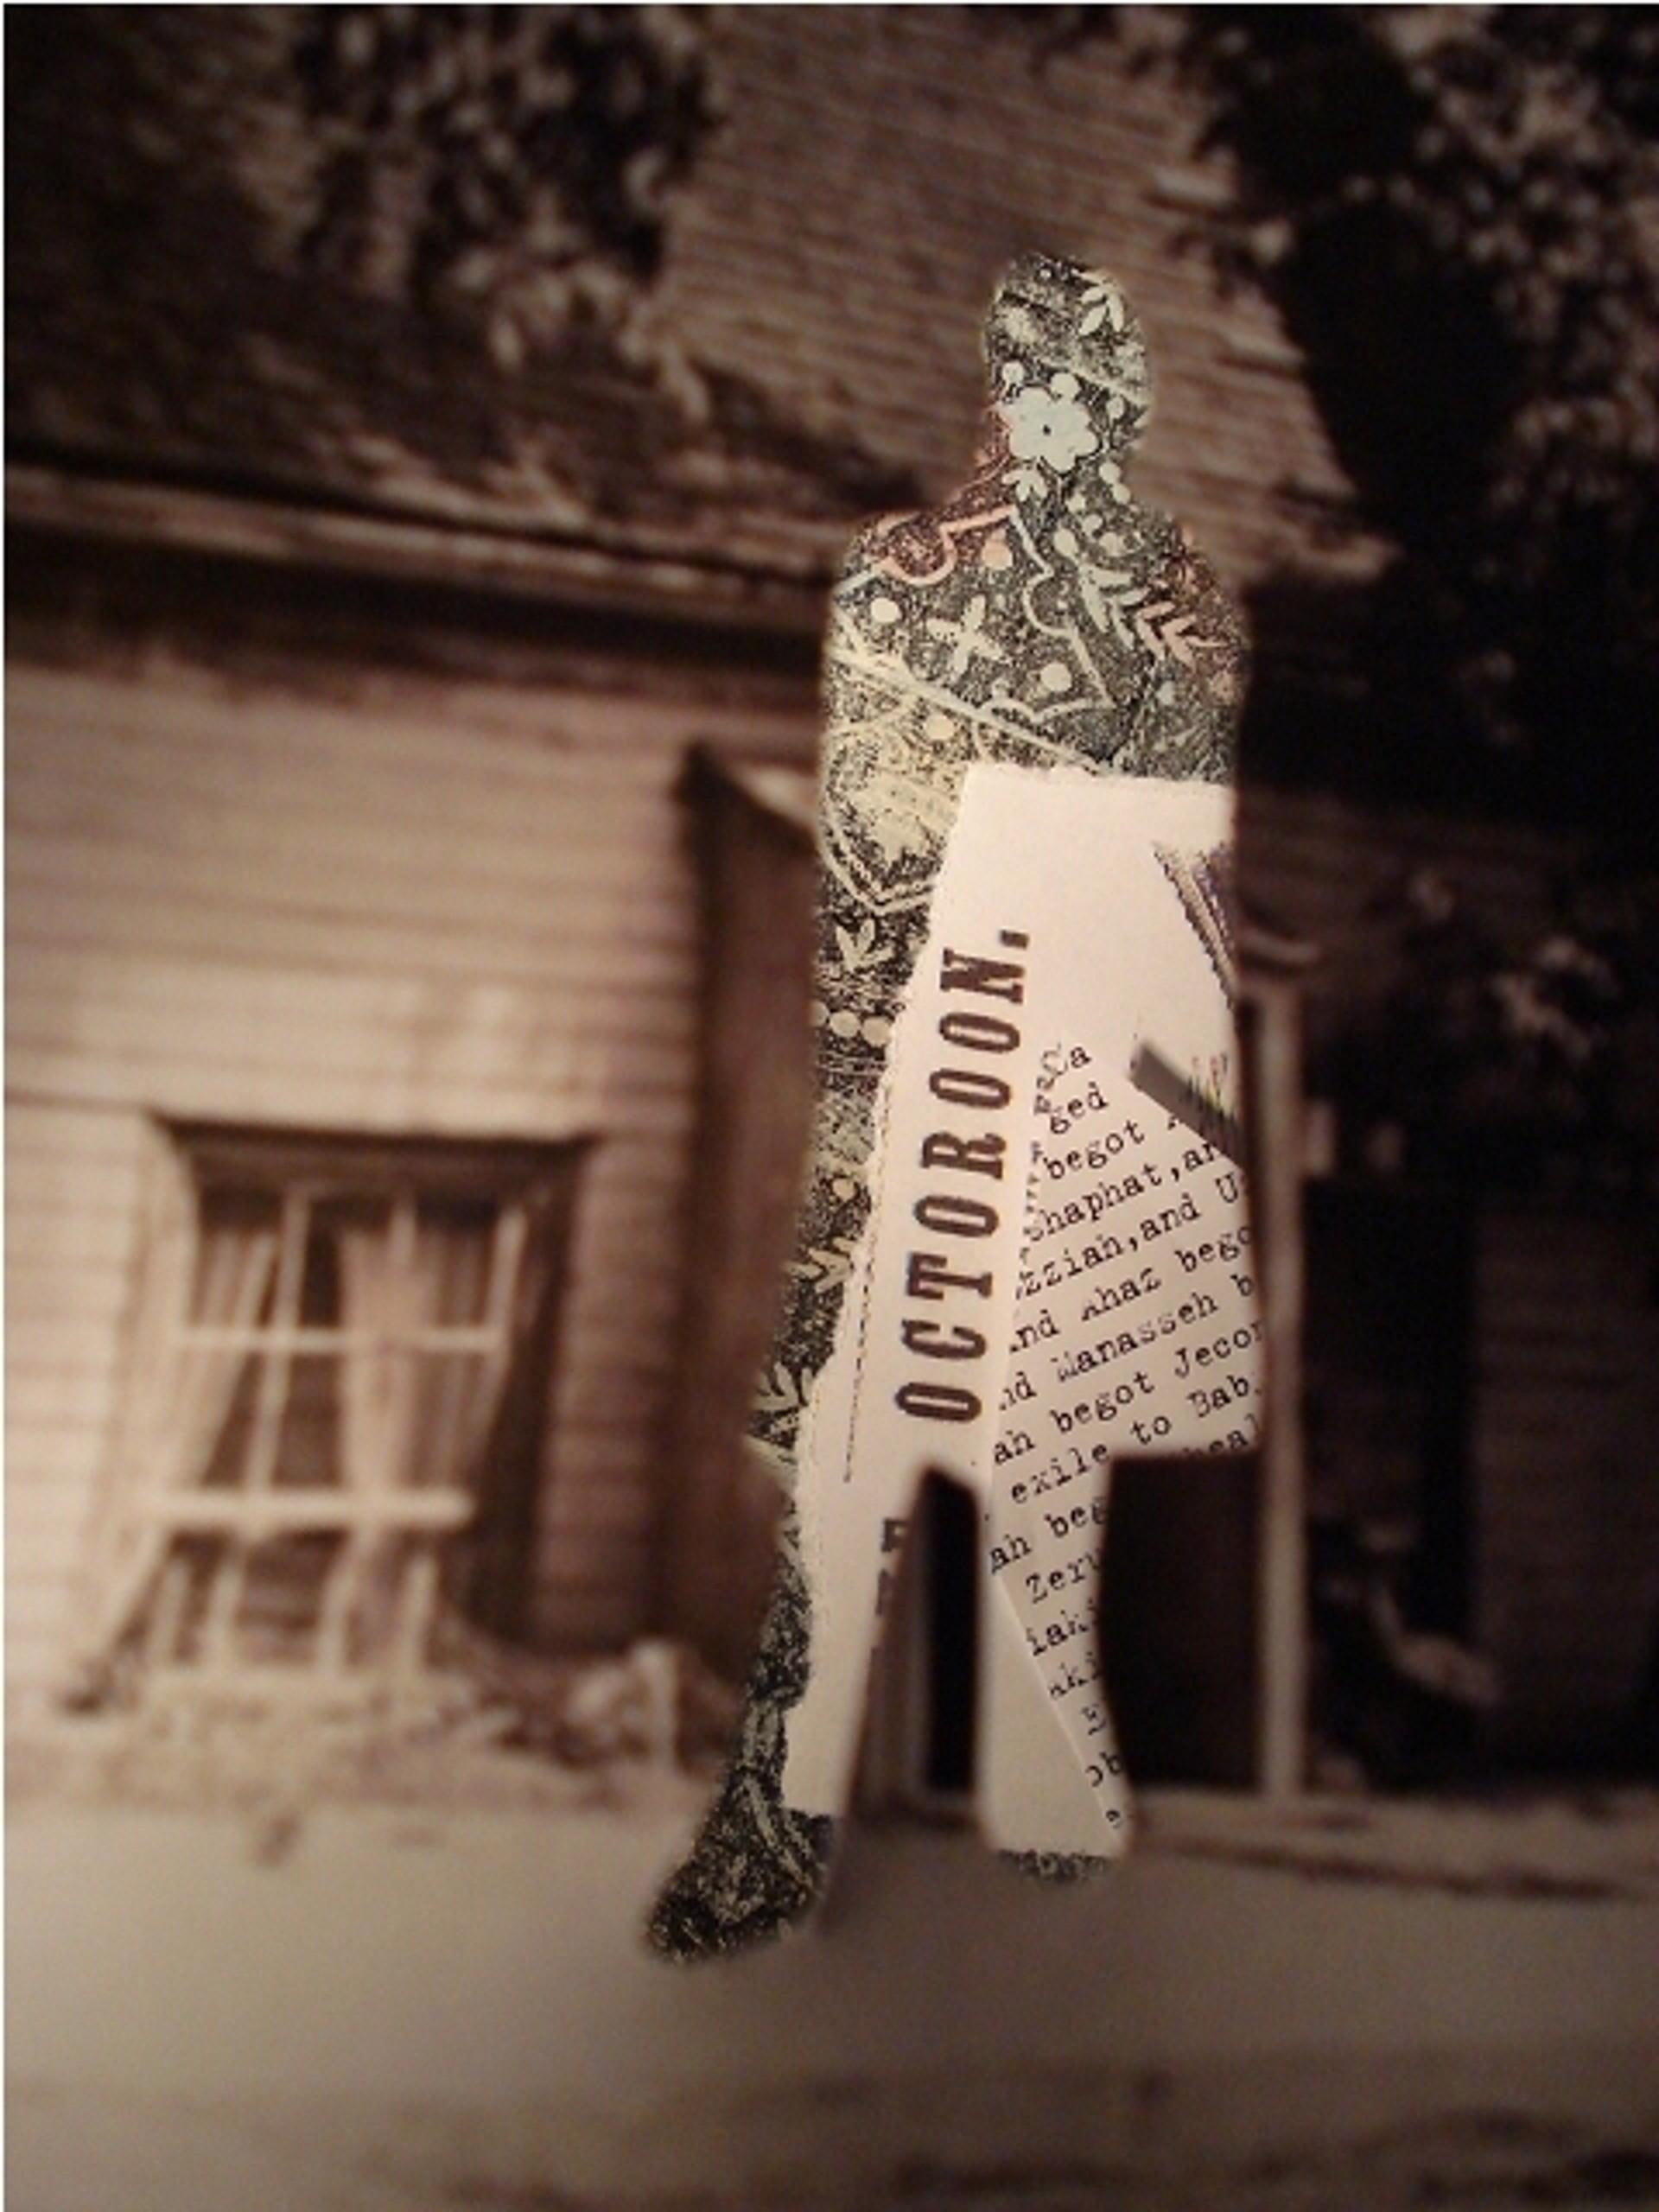 Secrets in the House by Kesha Bruce